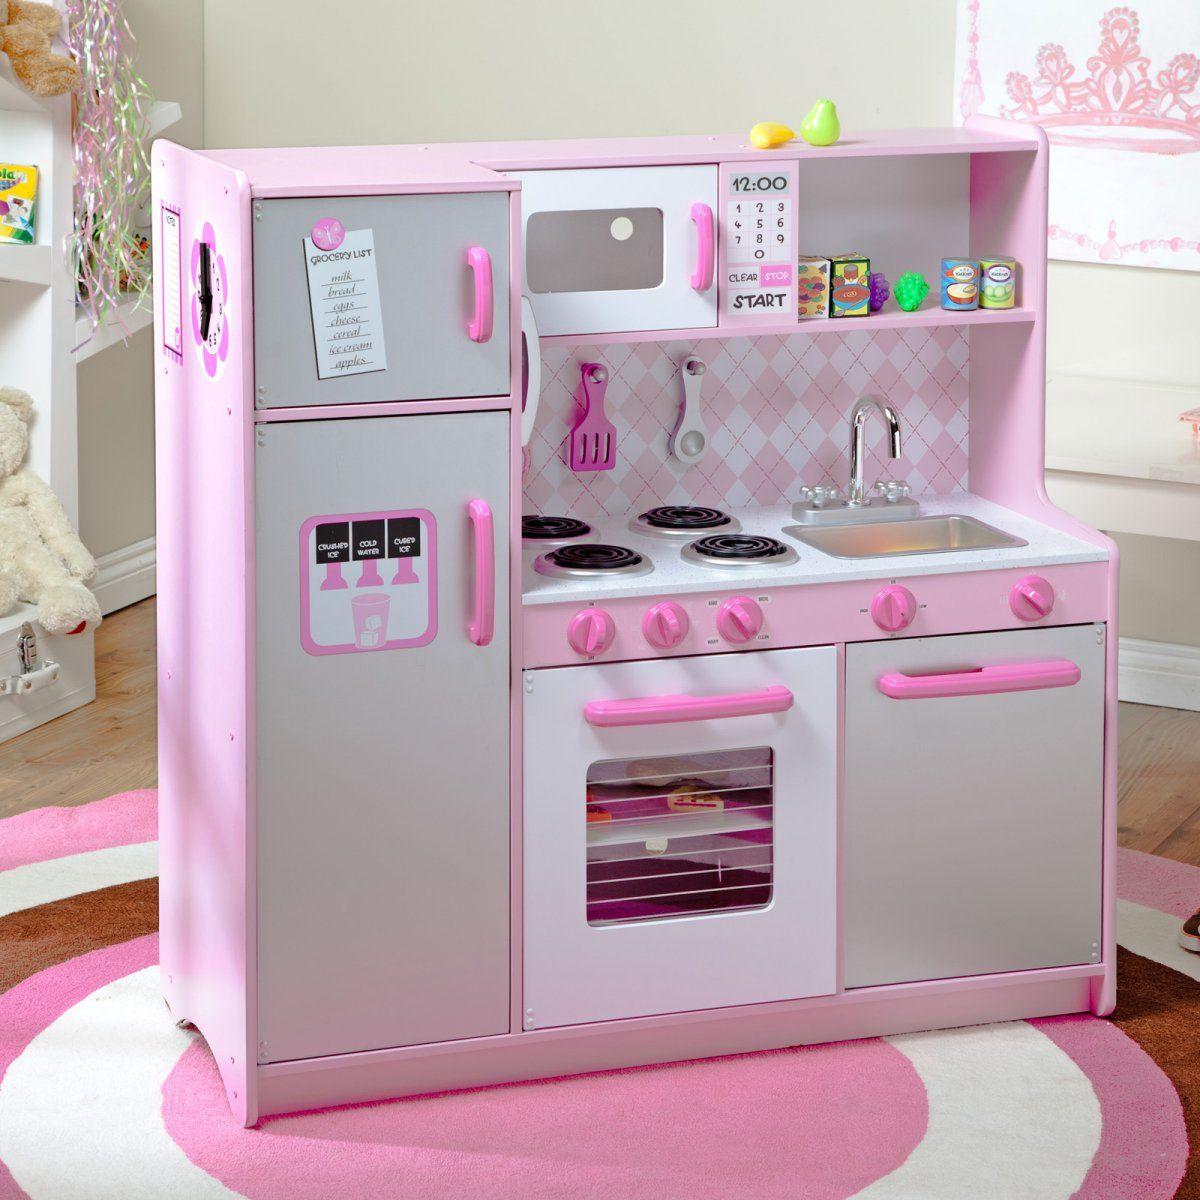 KidKraft Argyle Play Kitchen with 60 pc. Food Set Play